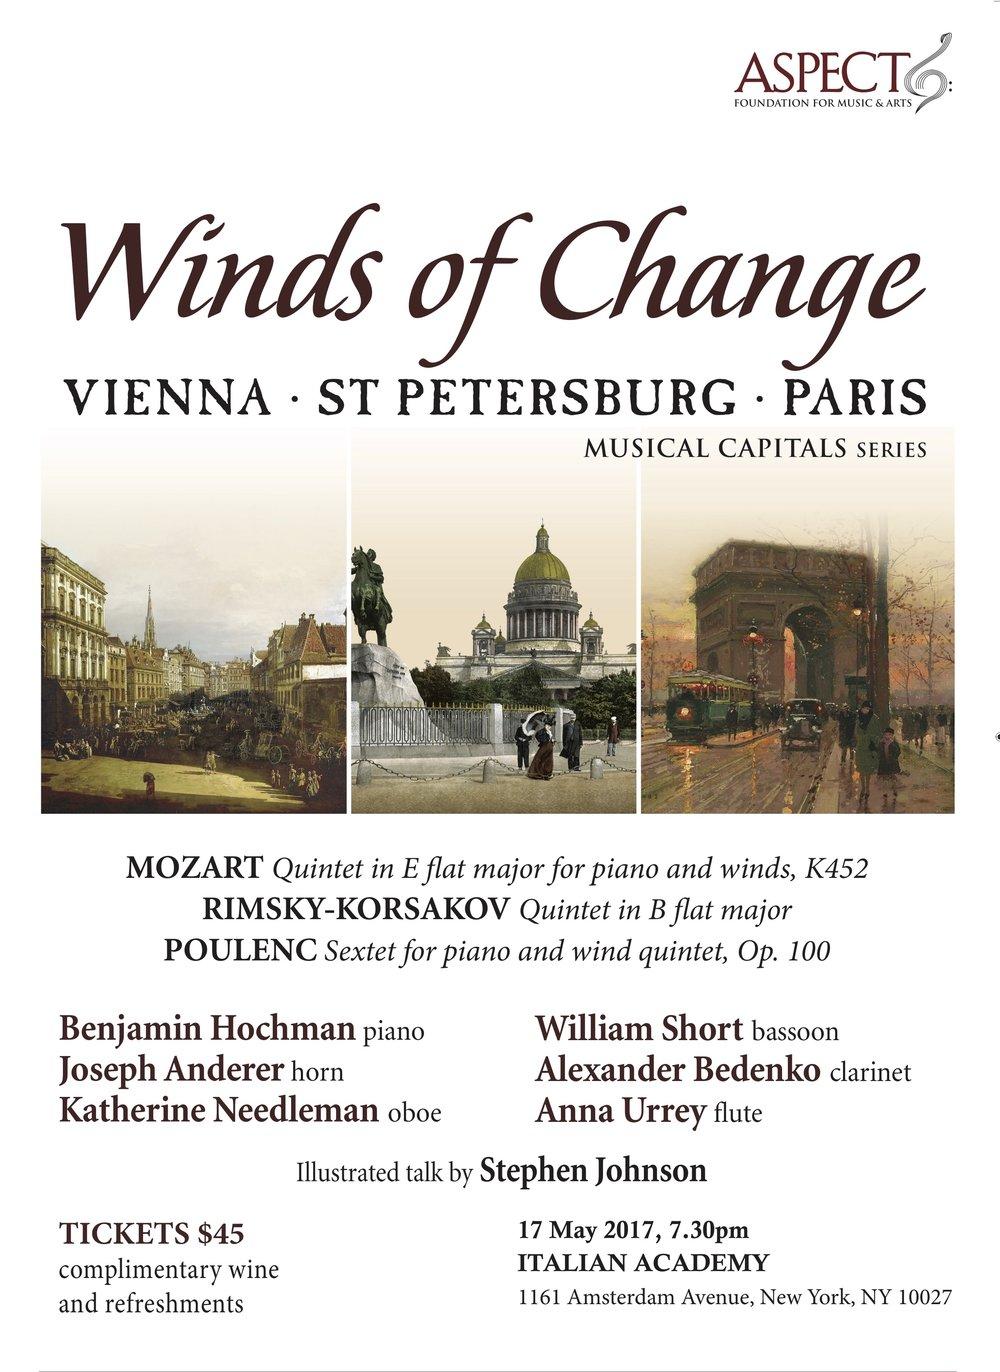 Winds of Change 16x24 poster DM.jpg